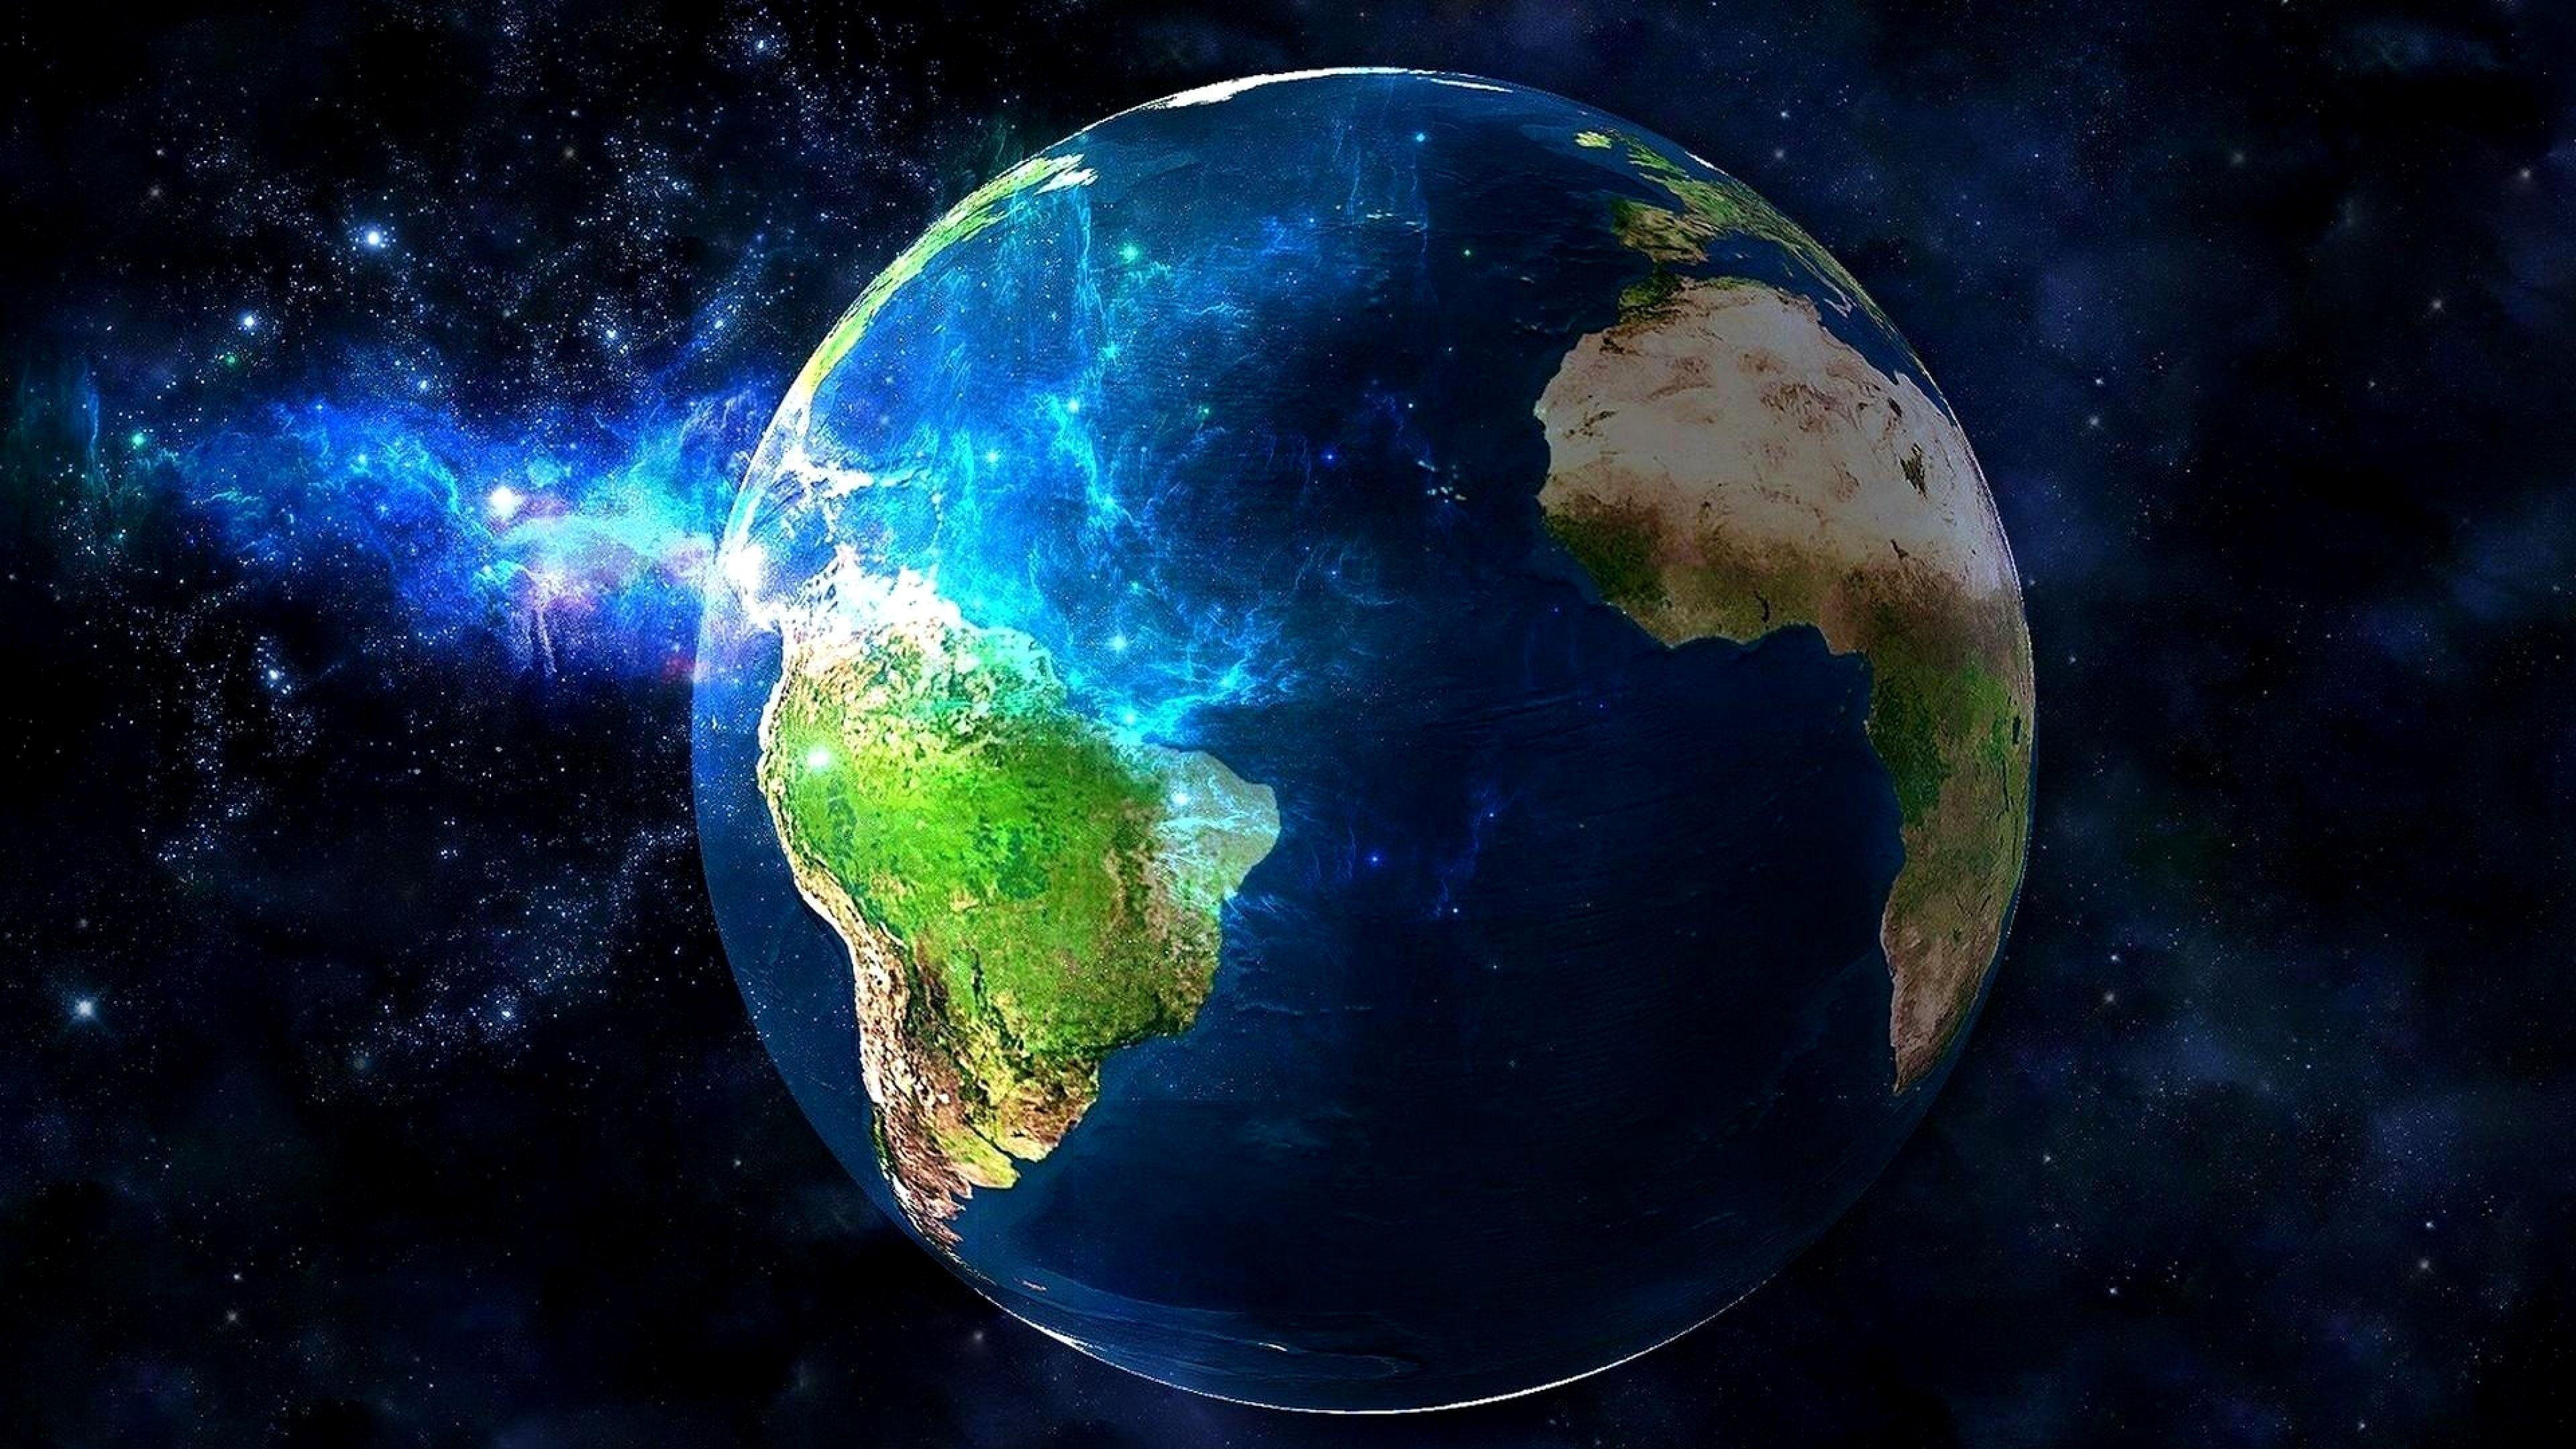 4k Wallpaper Earth Space Trick In 2020 Wallpaper Earth Earth From Space Earth Hd